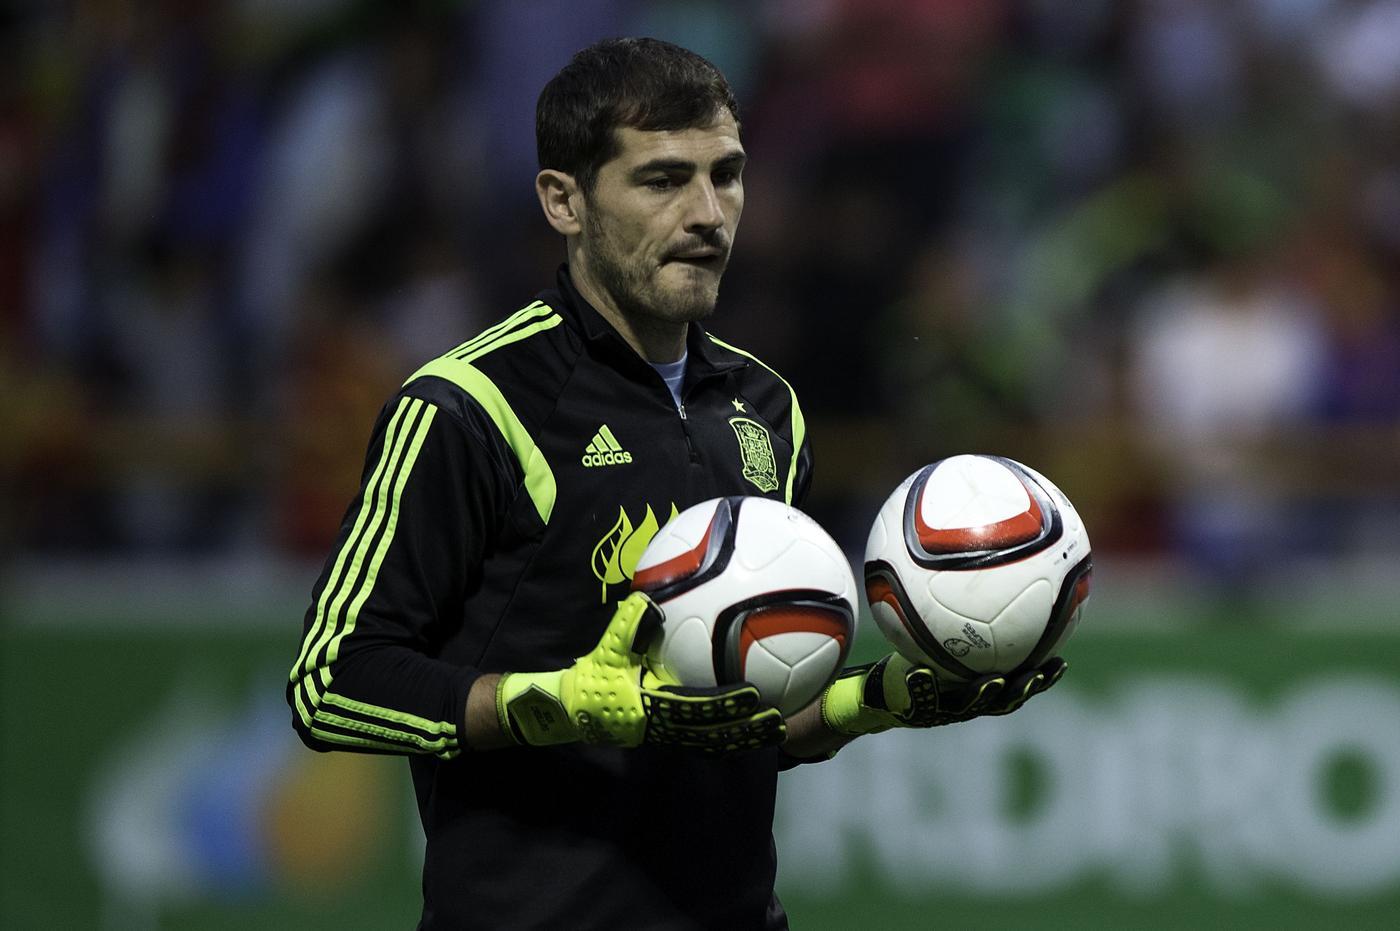 Iker Casillas' agent 'has met with Tottenham to discuss transfer'